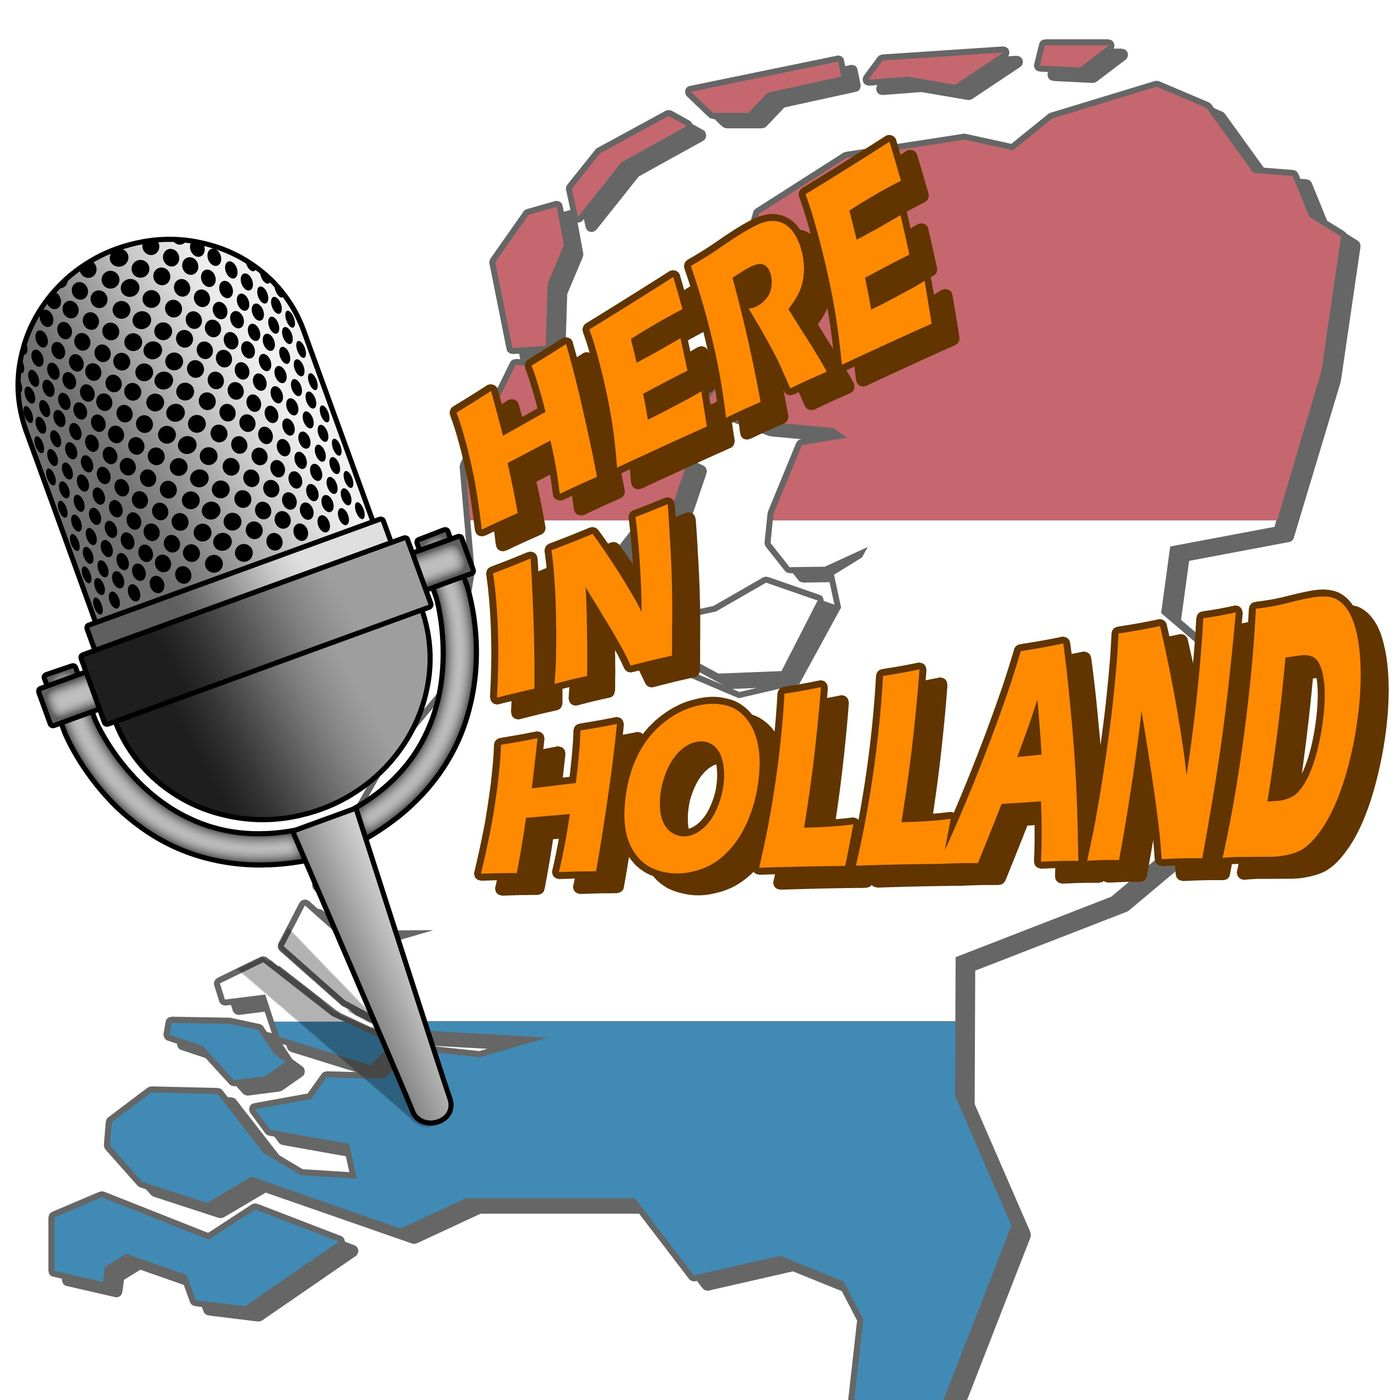 Here in Holland Incredible LOL Hero